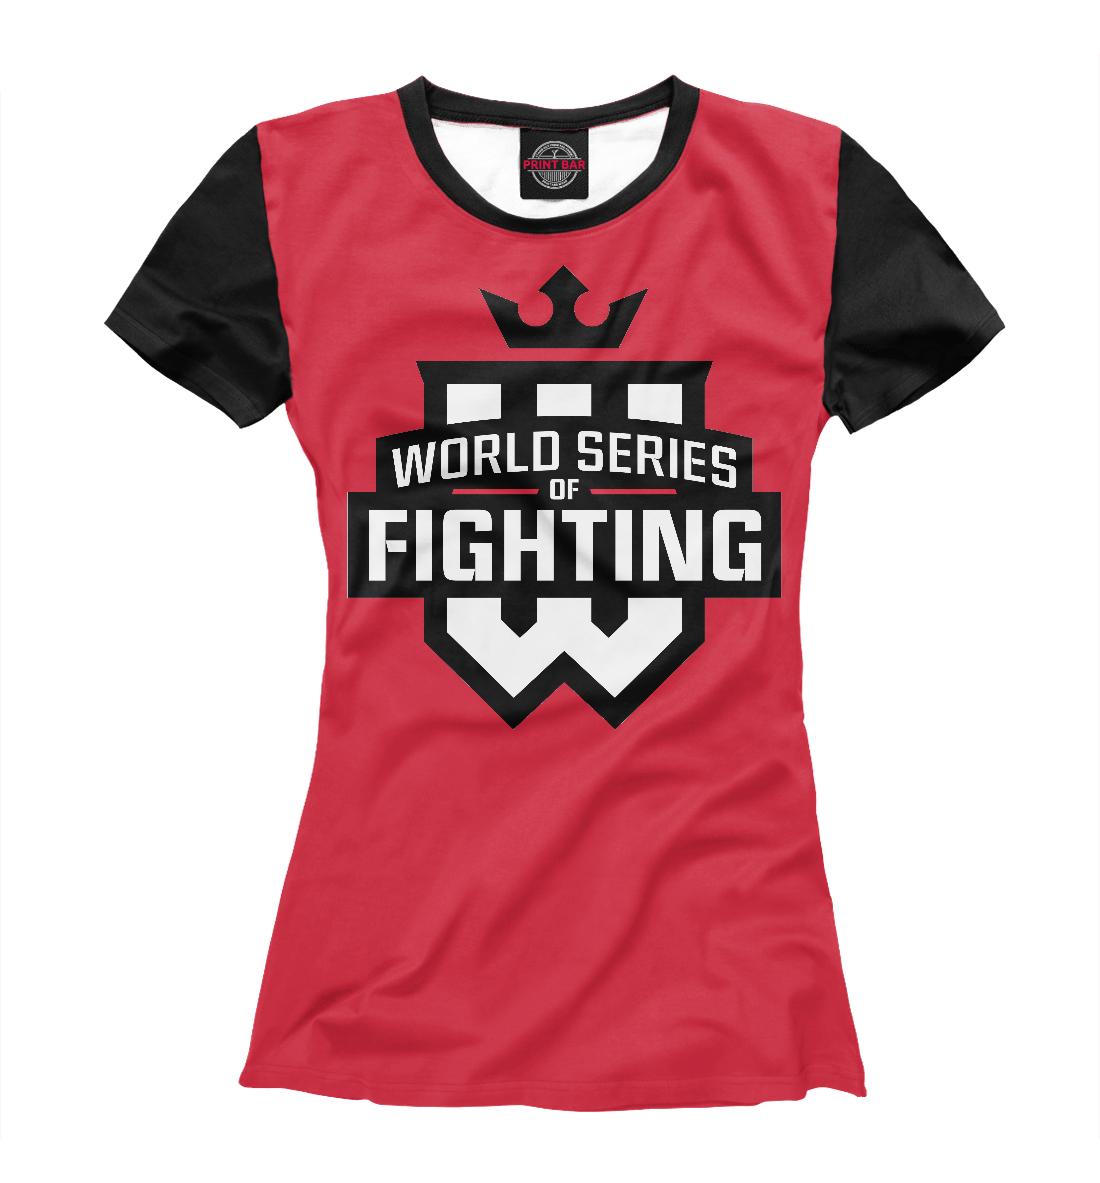 Купить WSOF: World Series Of Fighting, Printbar, Футболки, MNU-671710-fut-1